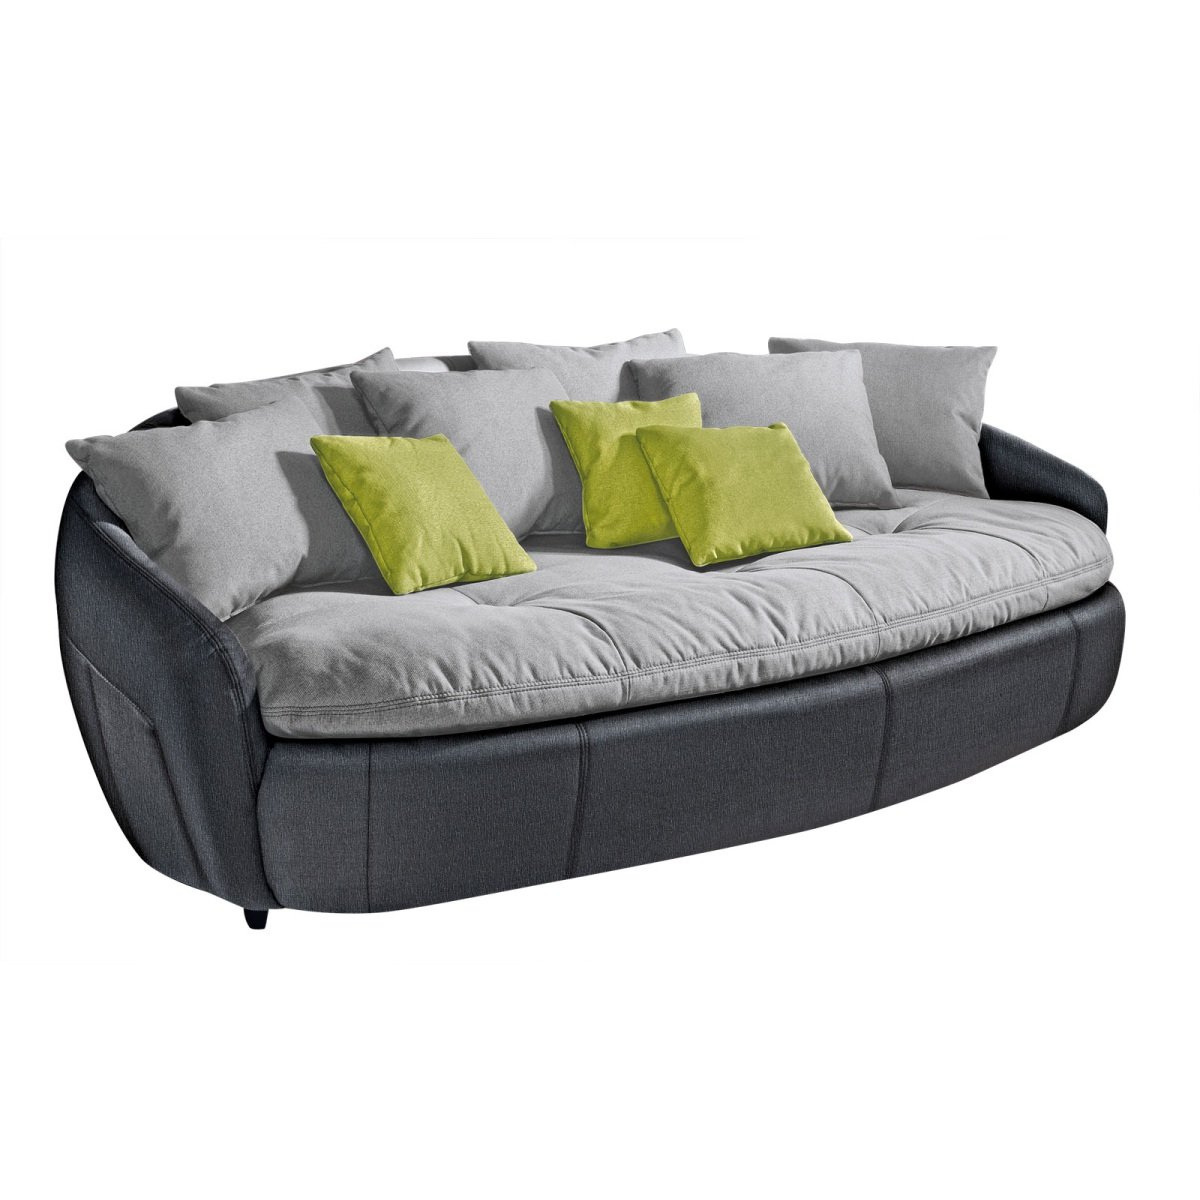 mobel boss couch 11 elegant mobel boss couch